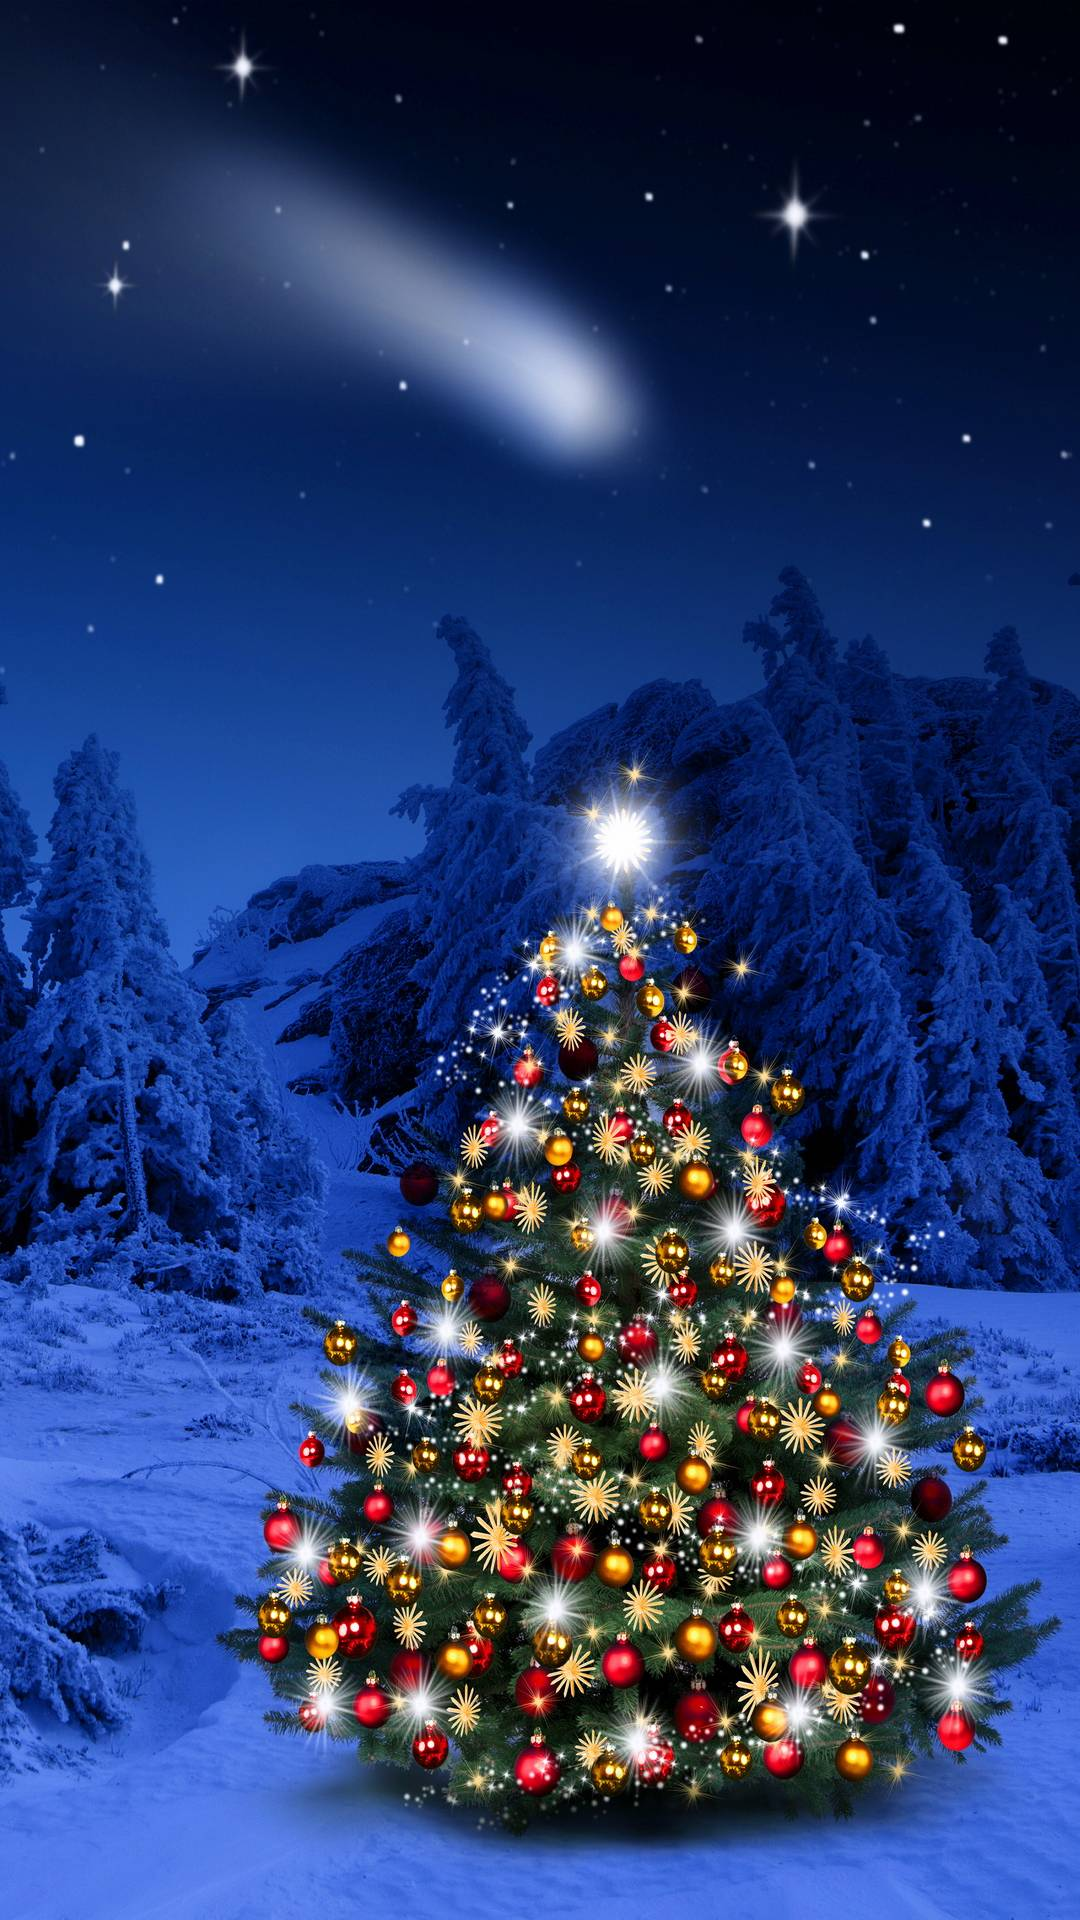 Winter Christmas Tree iPhone Wallpaper